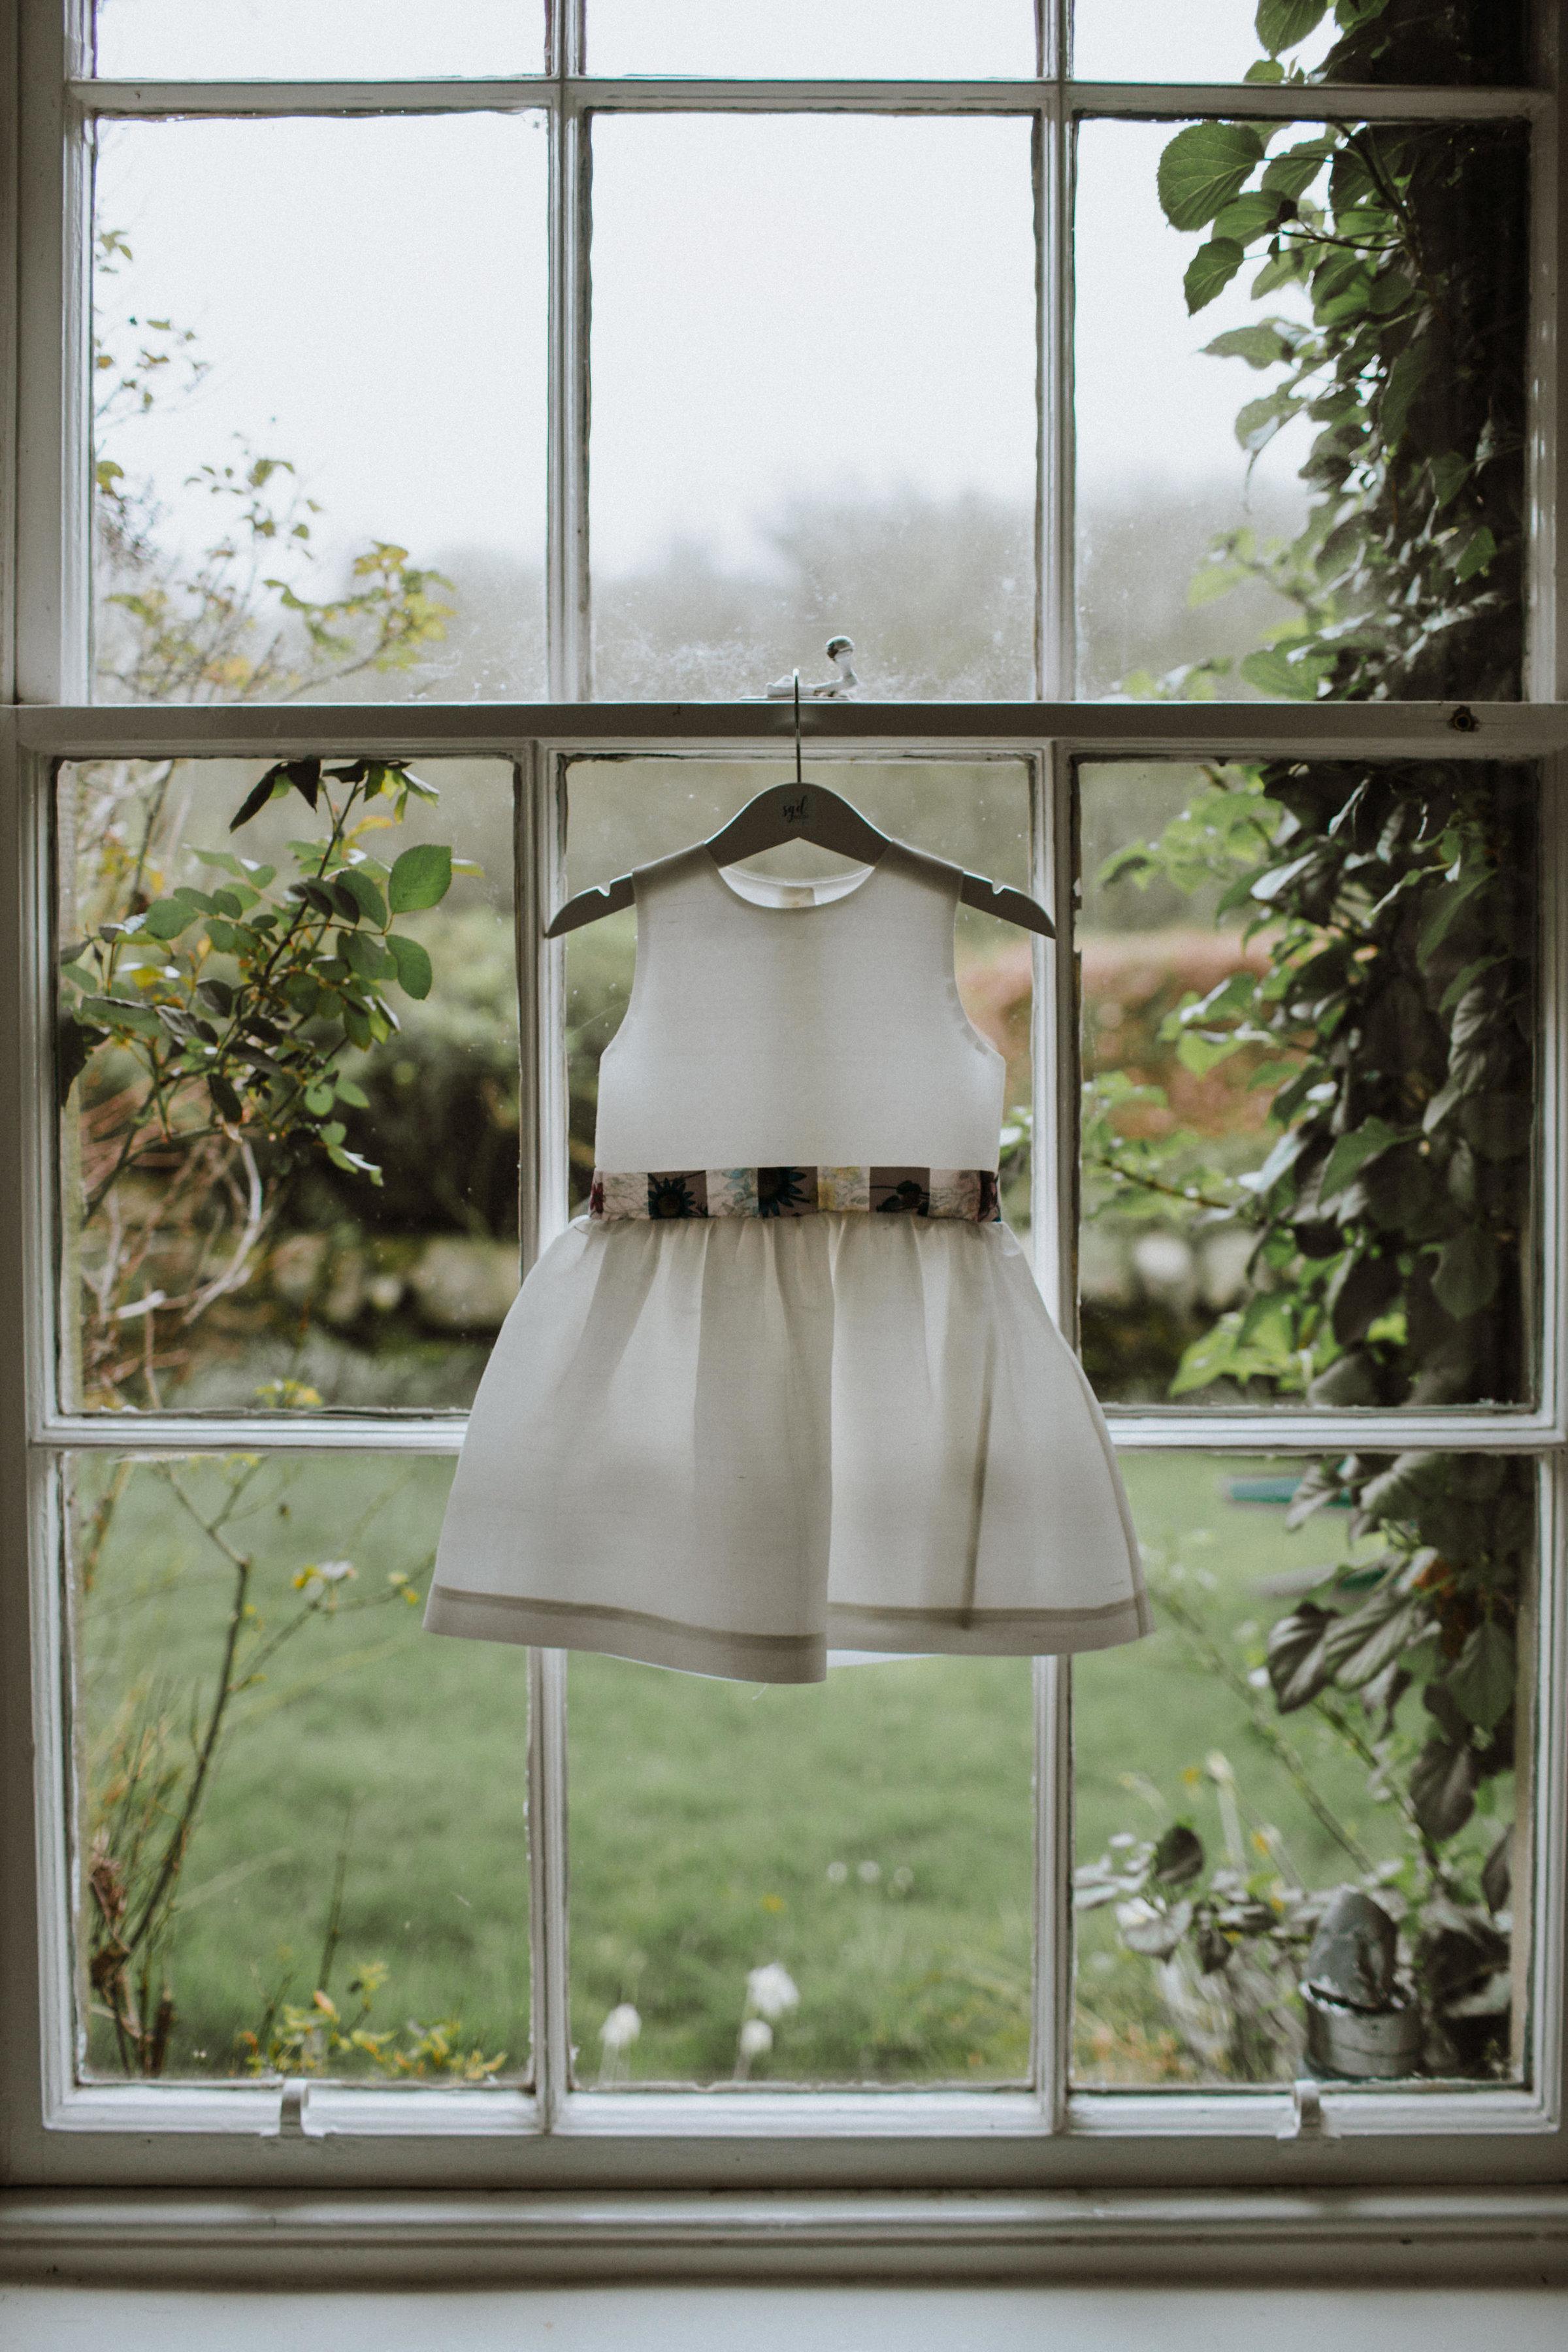 Katt-Scotland-Comrie-Crieff-Bias-Crepe-Wedding-Gown-Lace-Bridal-Biker-Jacket-Bespoke-Susanna-Greening-Derbyshire-23